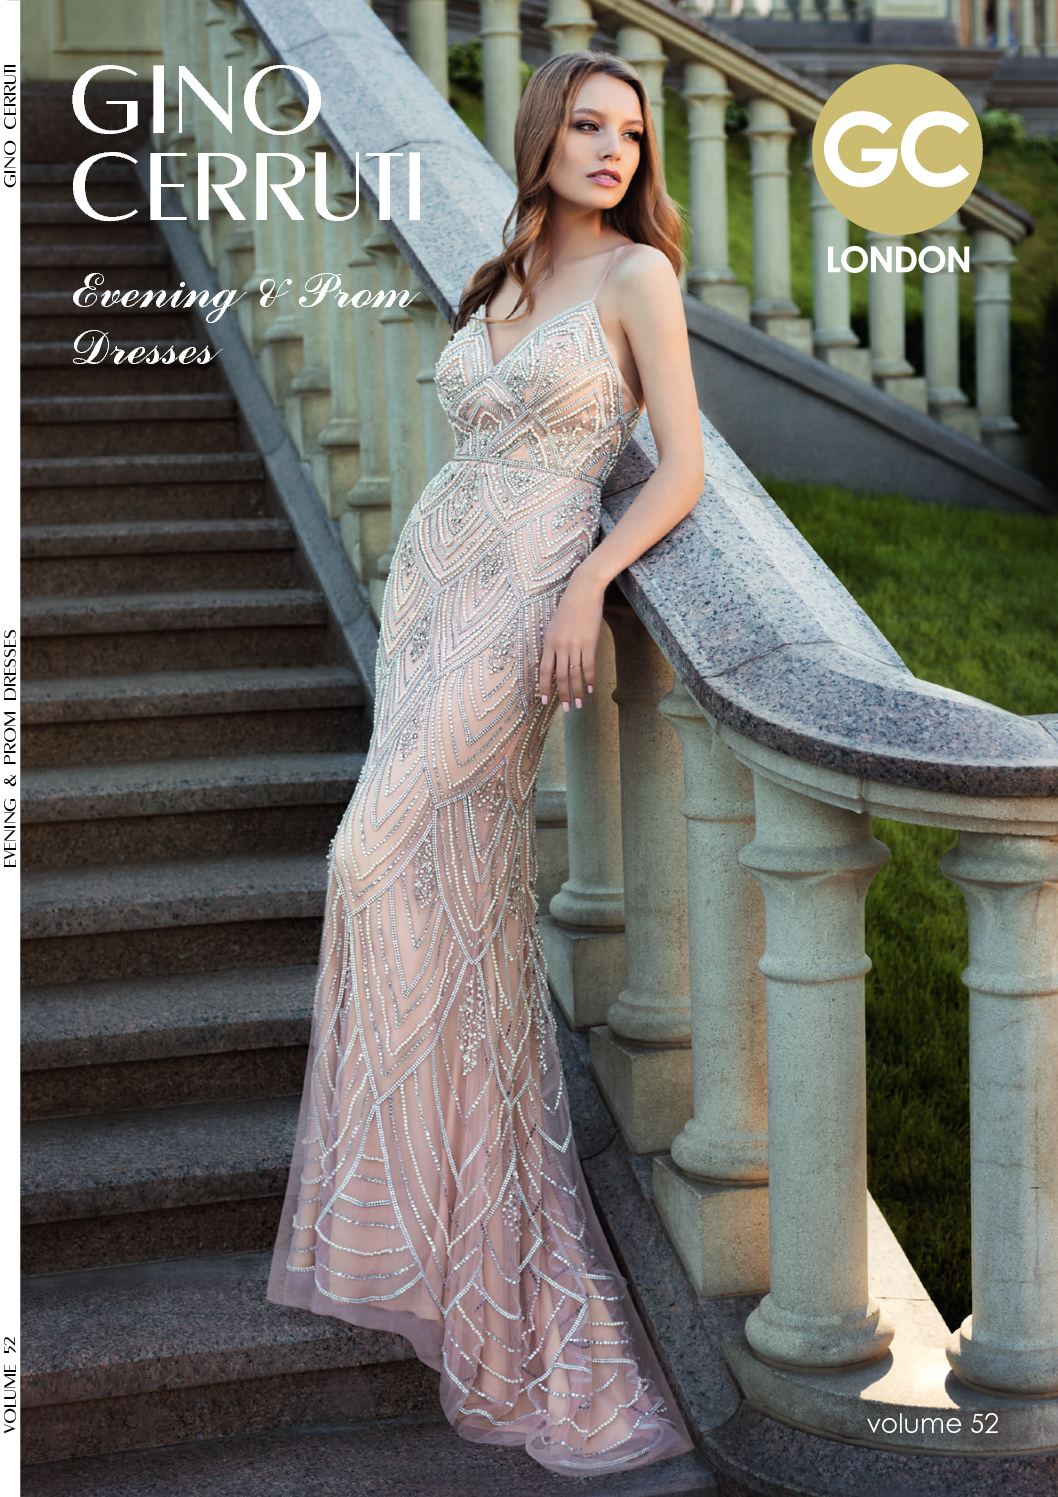 54c65aaa4ad Calaméo - Gino Cerruti Evening & Prom dresses volume 52